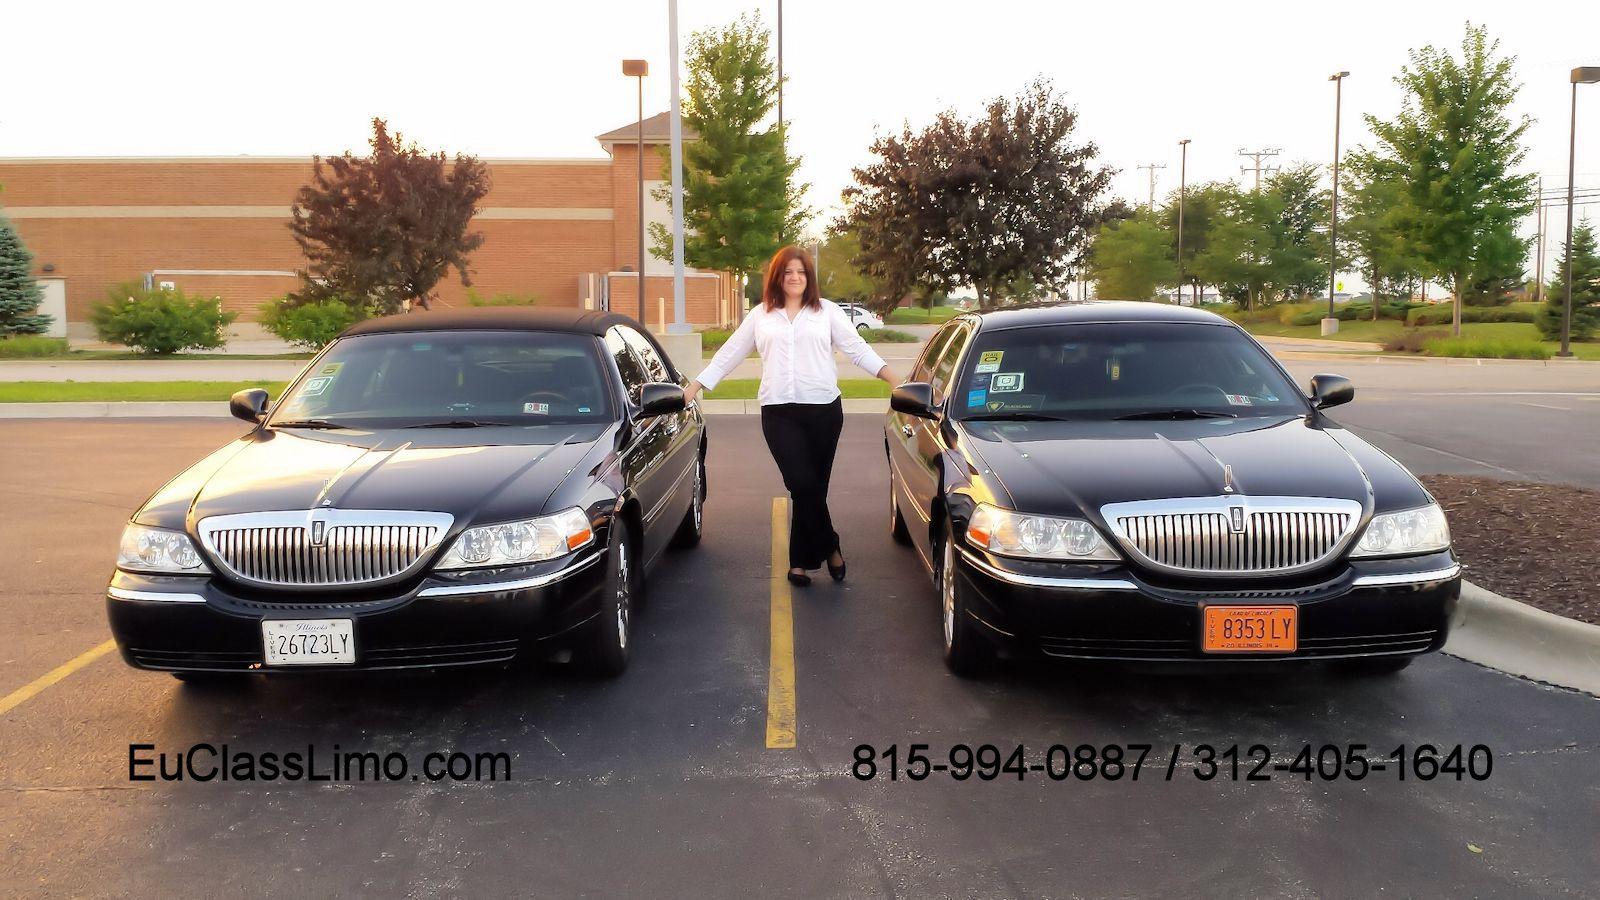 Chicago - Uber Black and Uber Black SUV experience | Uber